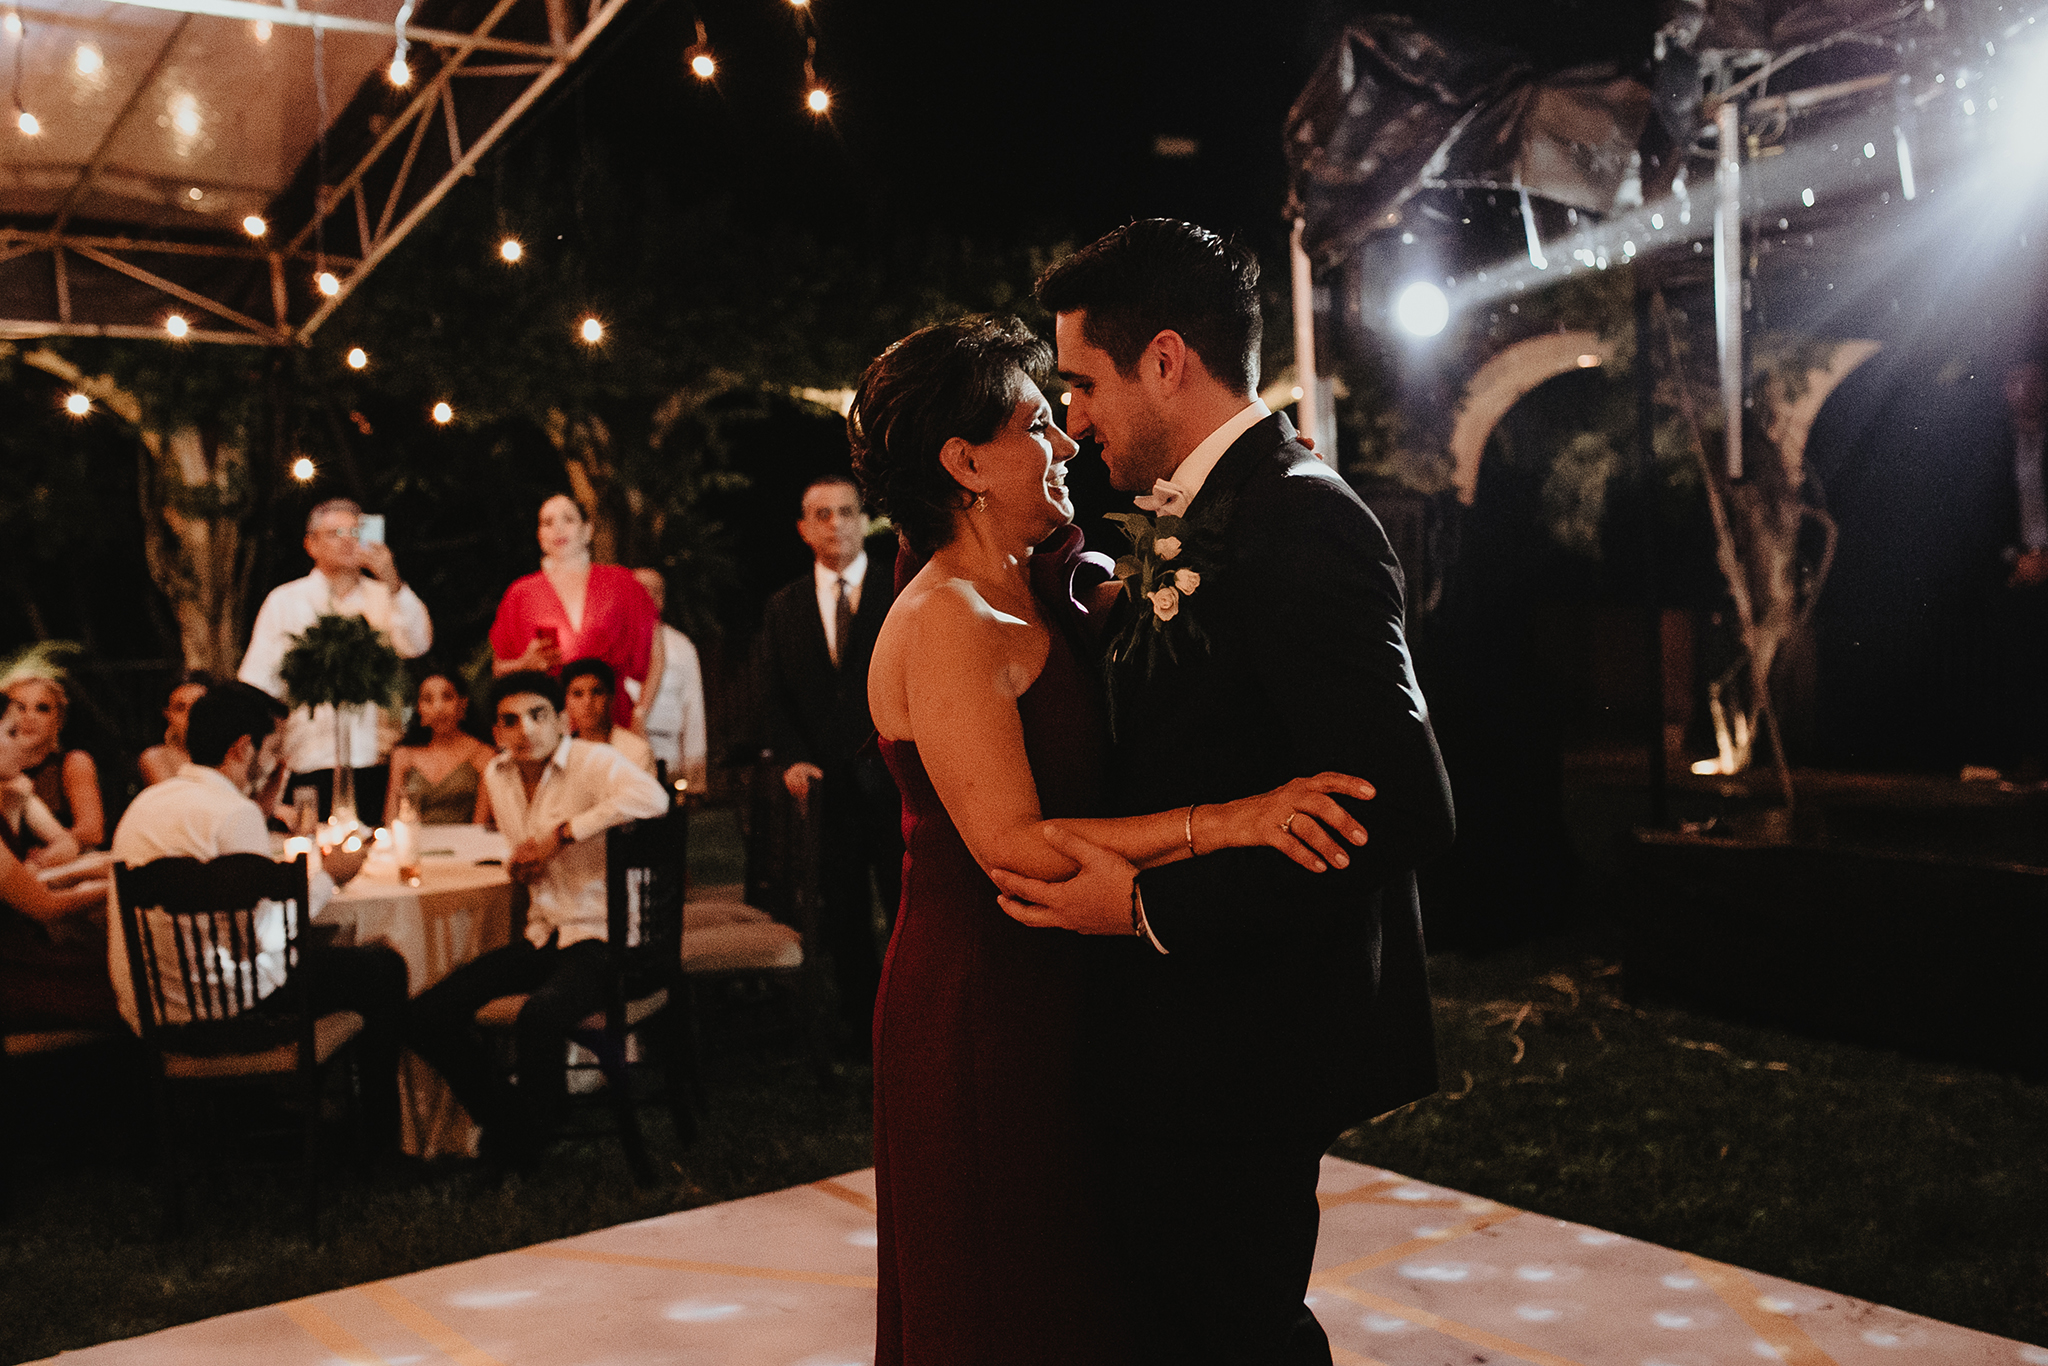 1023R&F__WeddingDestination_Weddingmerida_BodaMexico_FotografoDeBodas_FabrizioSimoneenFotografo.jpg